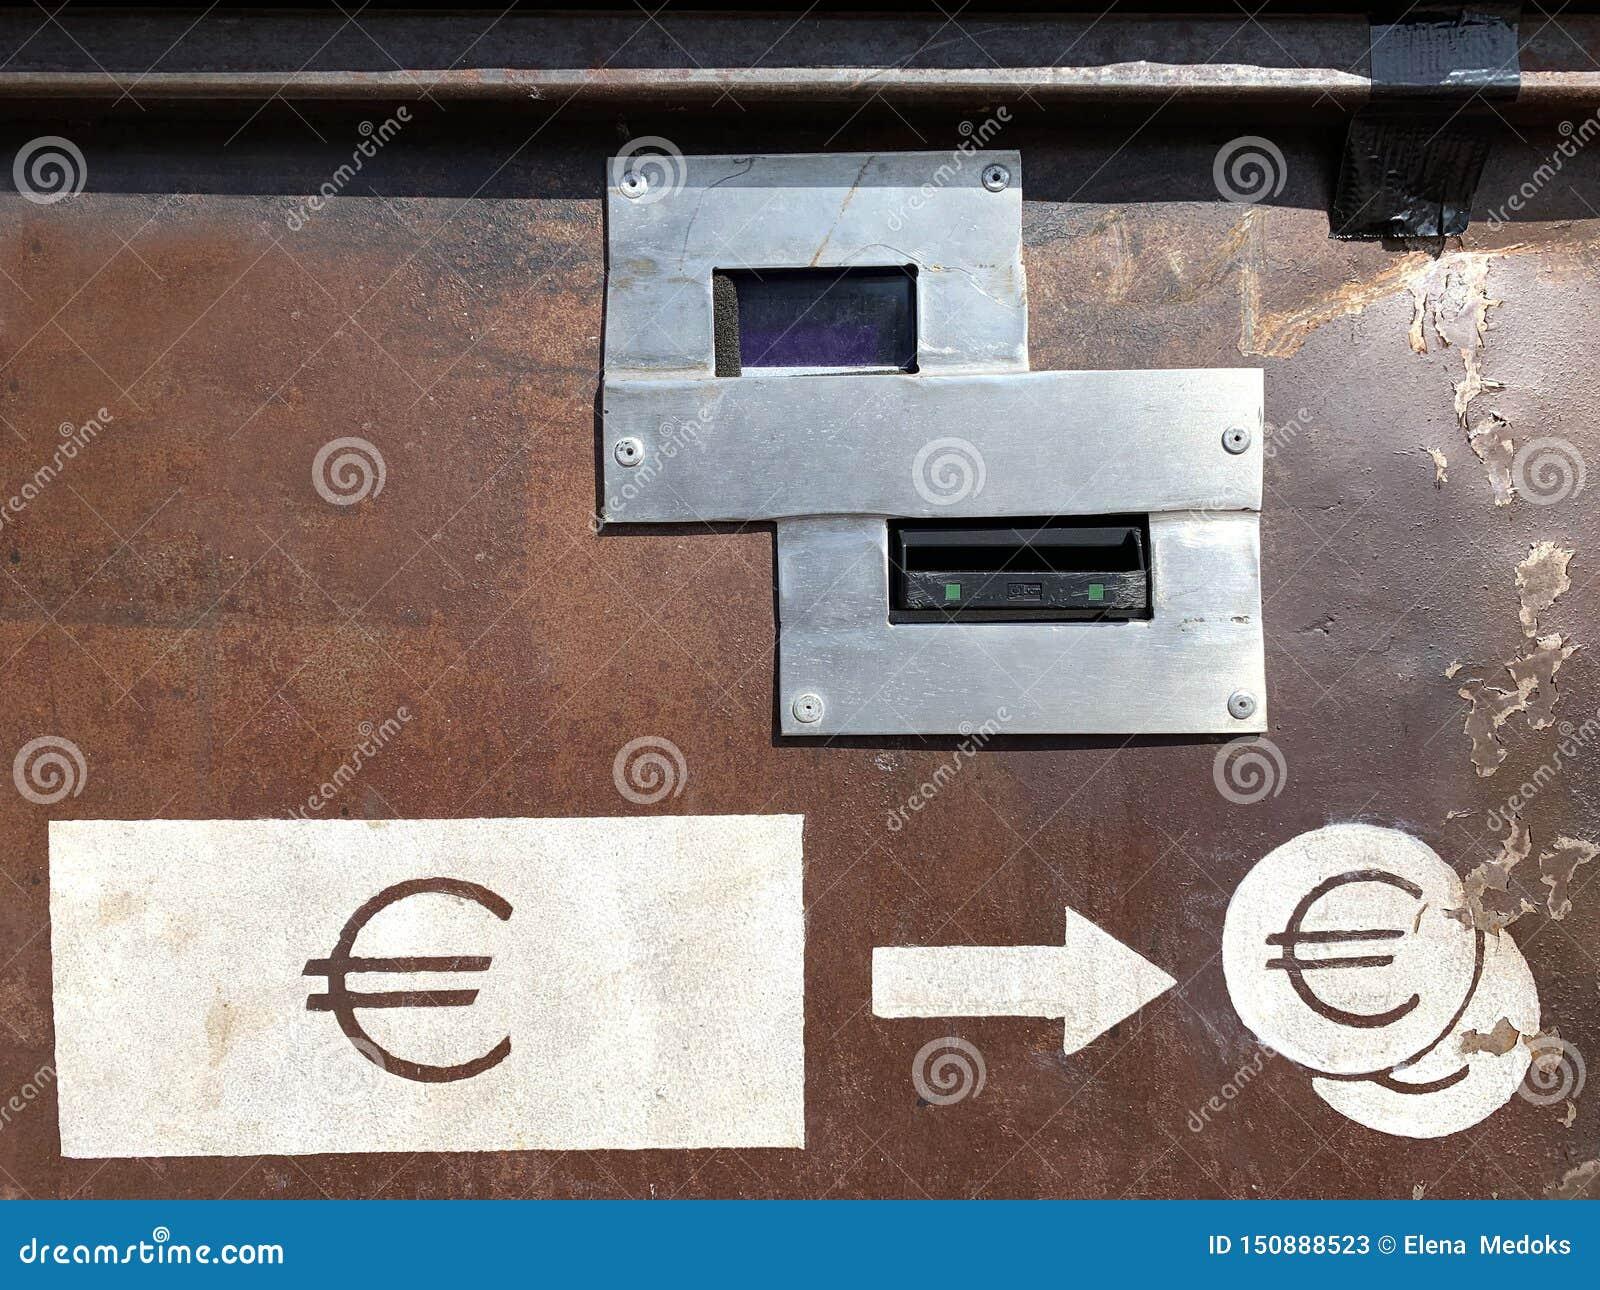 Euro paper money exchange machine